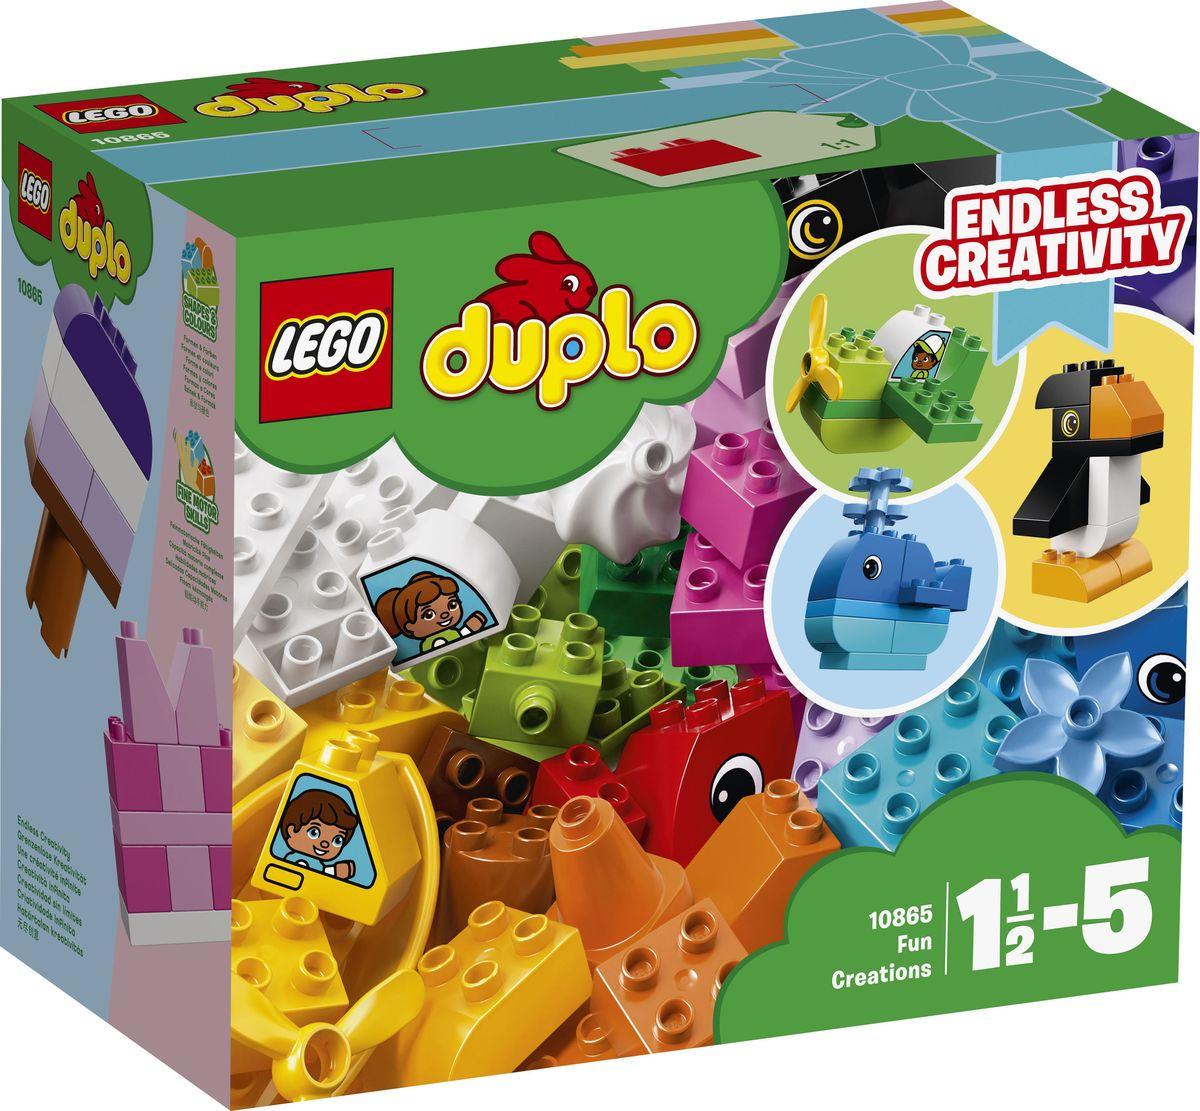 LEGO DUPLO My First Конструктор Веселые кубики 10865 lego duplo my first конструктор мои первые домашние животные 10858